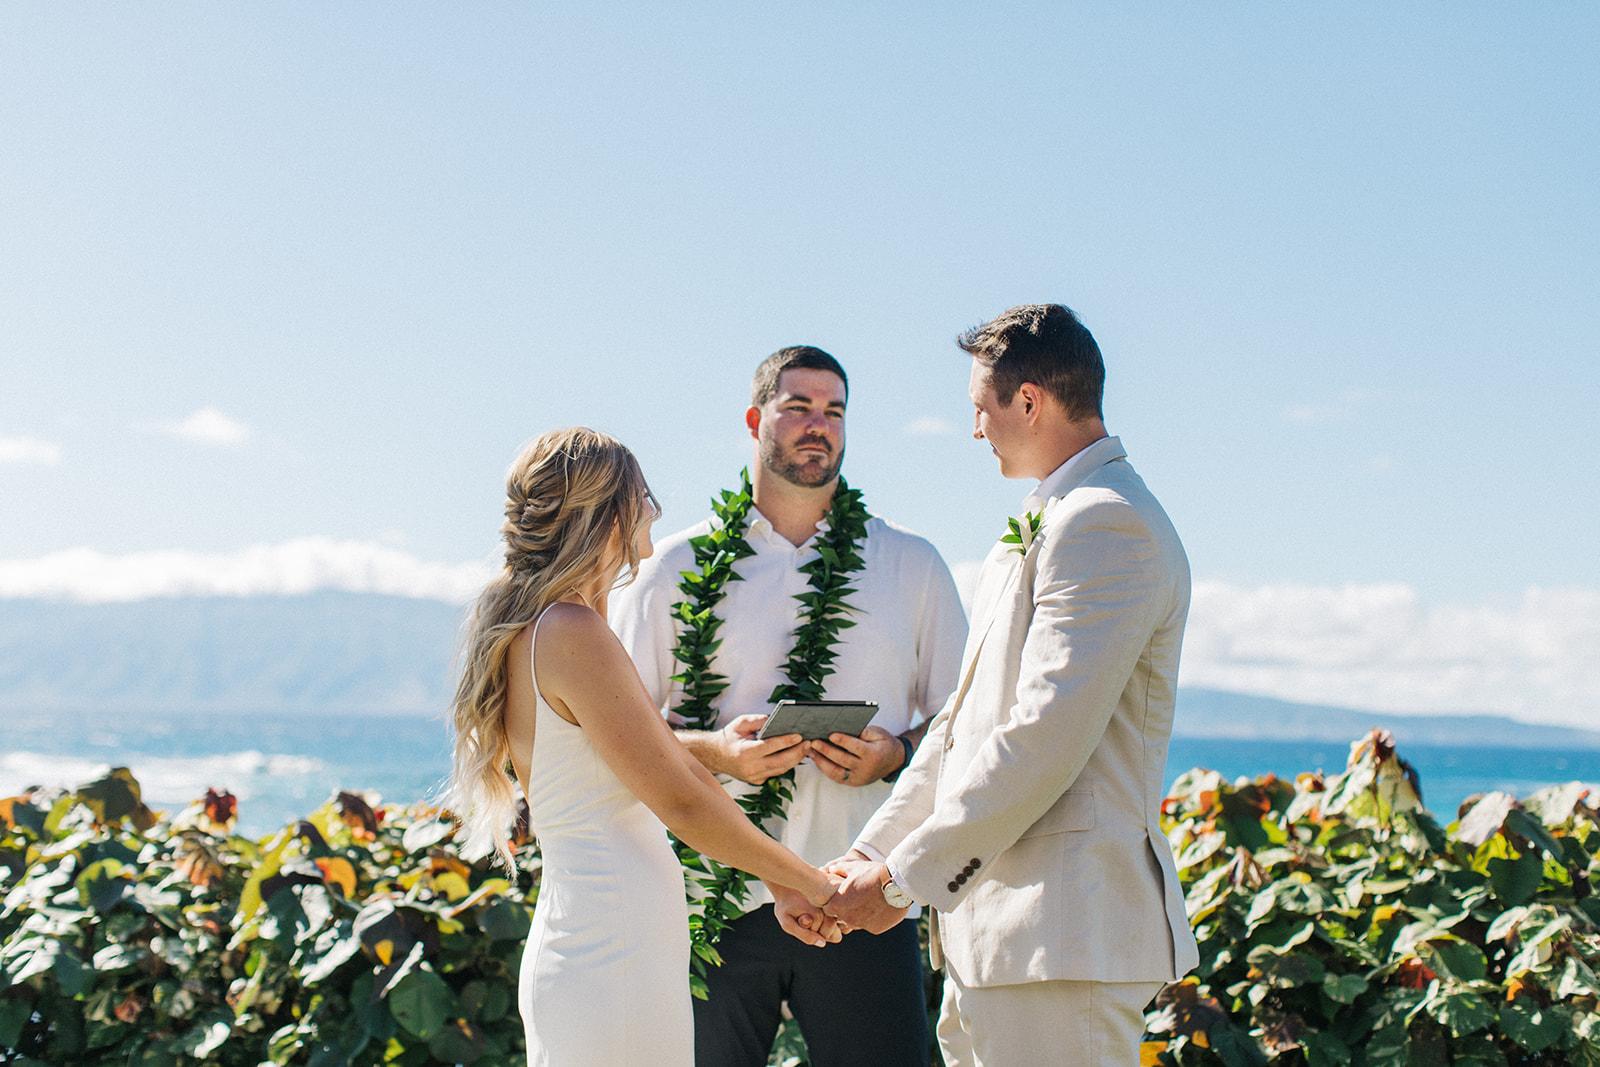 spokane bride and groom hawaii wedding ceremony